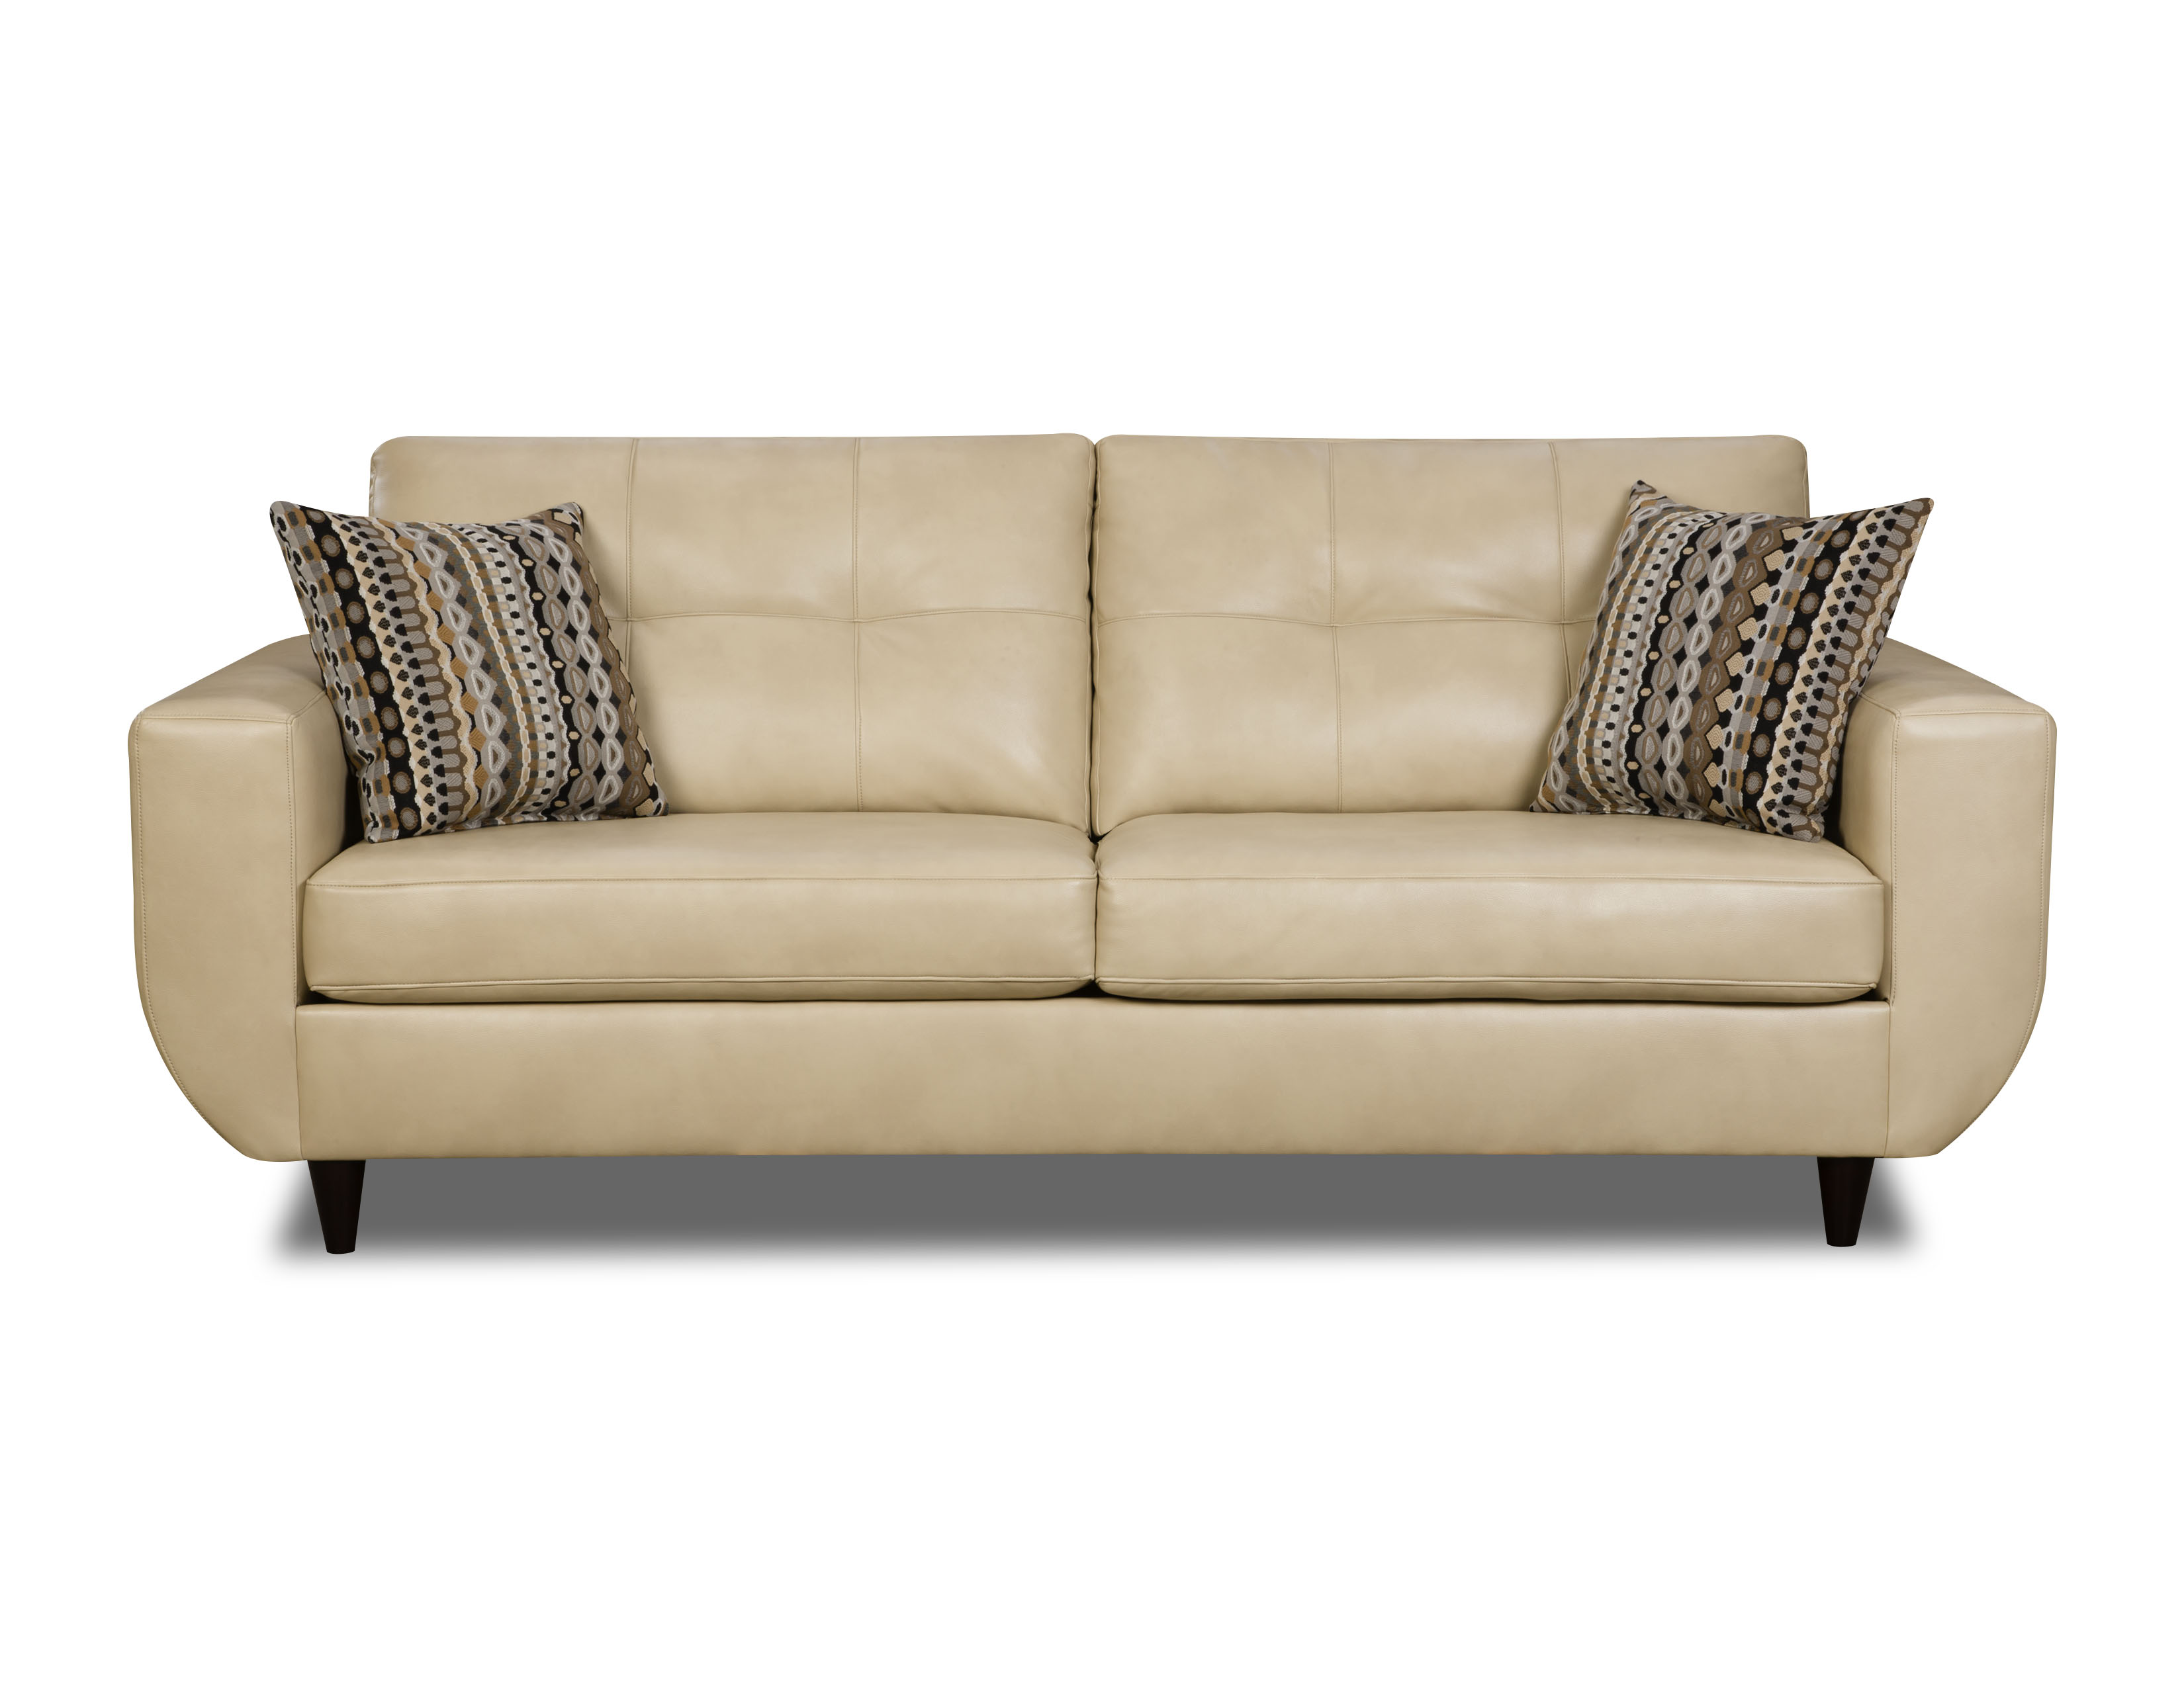 Leather Sofa Under 500